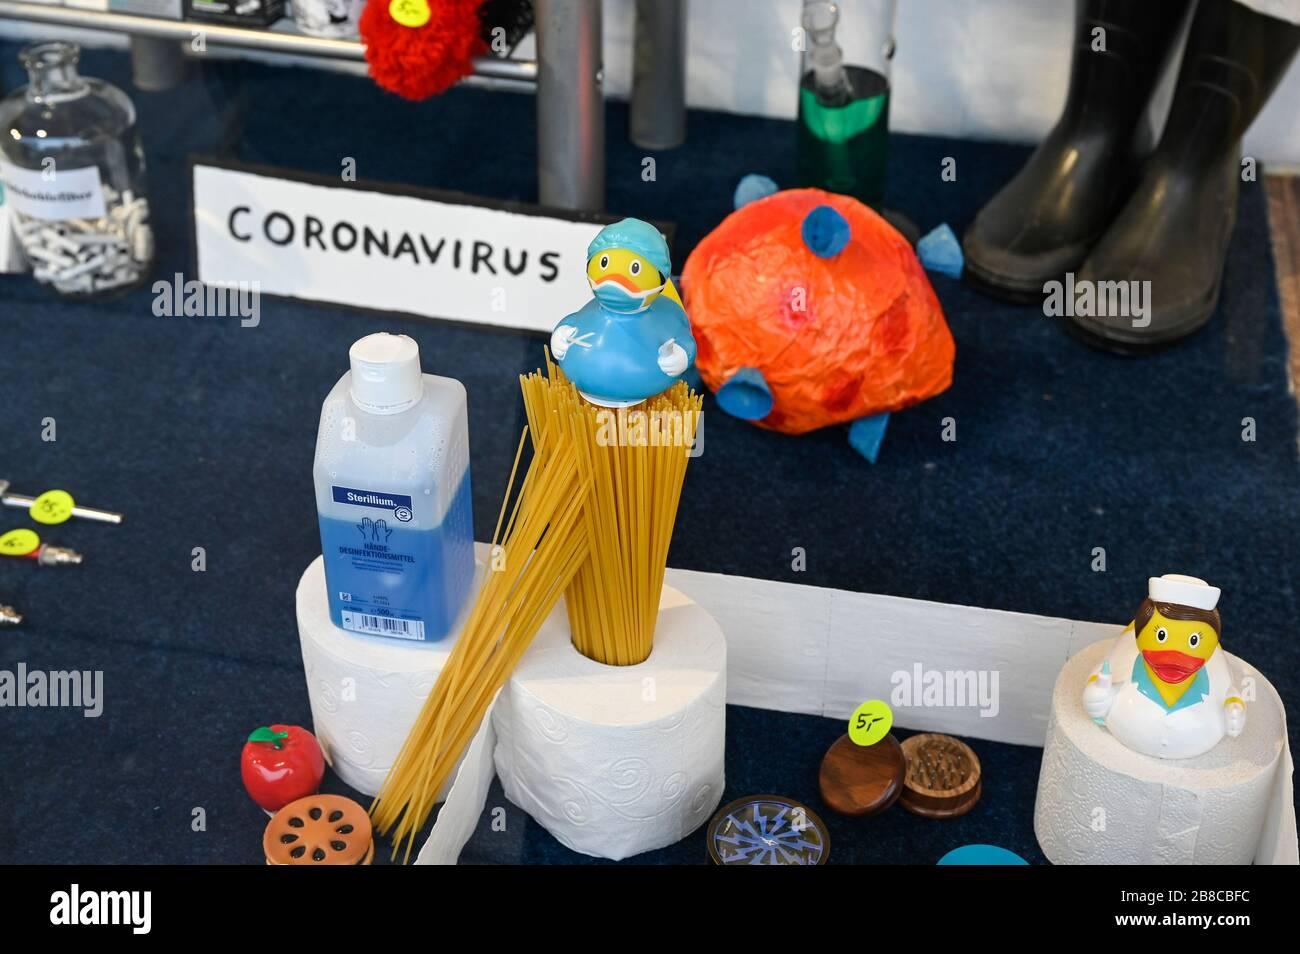 GERMANY, Hamburg, Corona Virus, COVID-19 , corona theme shopping window of a closed shop on reeperbahn, St. Pauli district, rare items during Hamster purchase: antiseptics, noodle, toilet paper Stock Photo